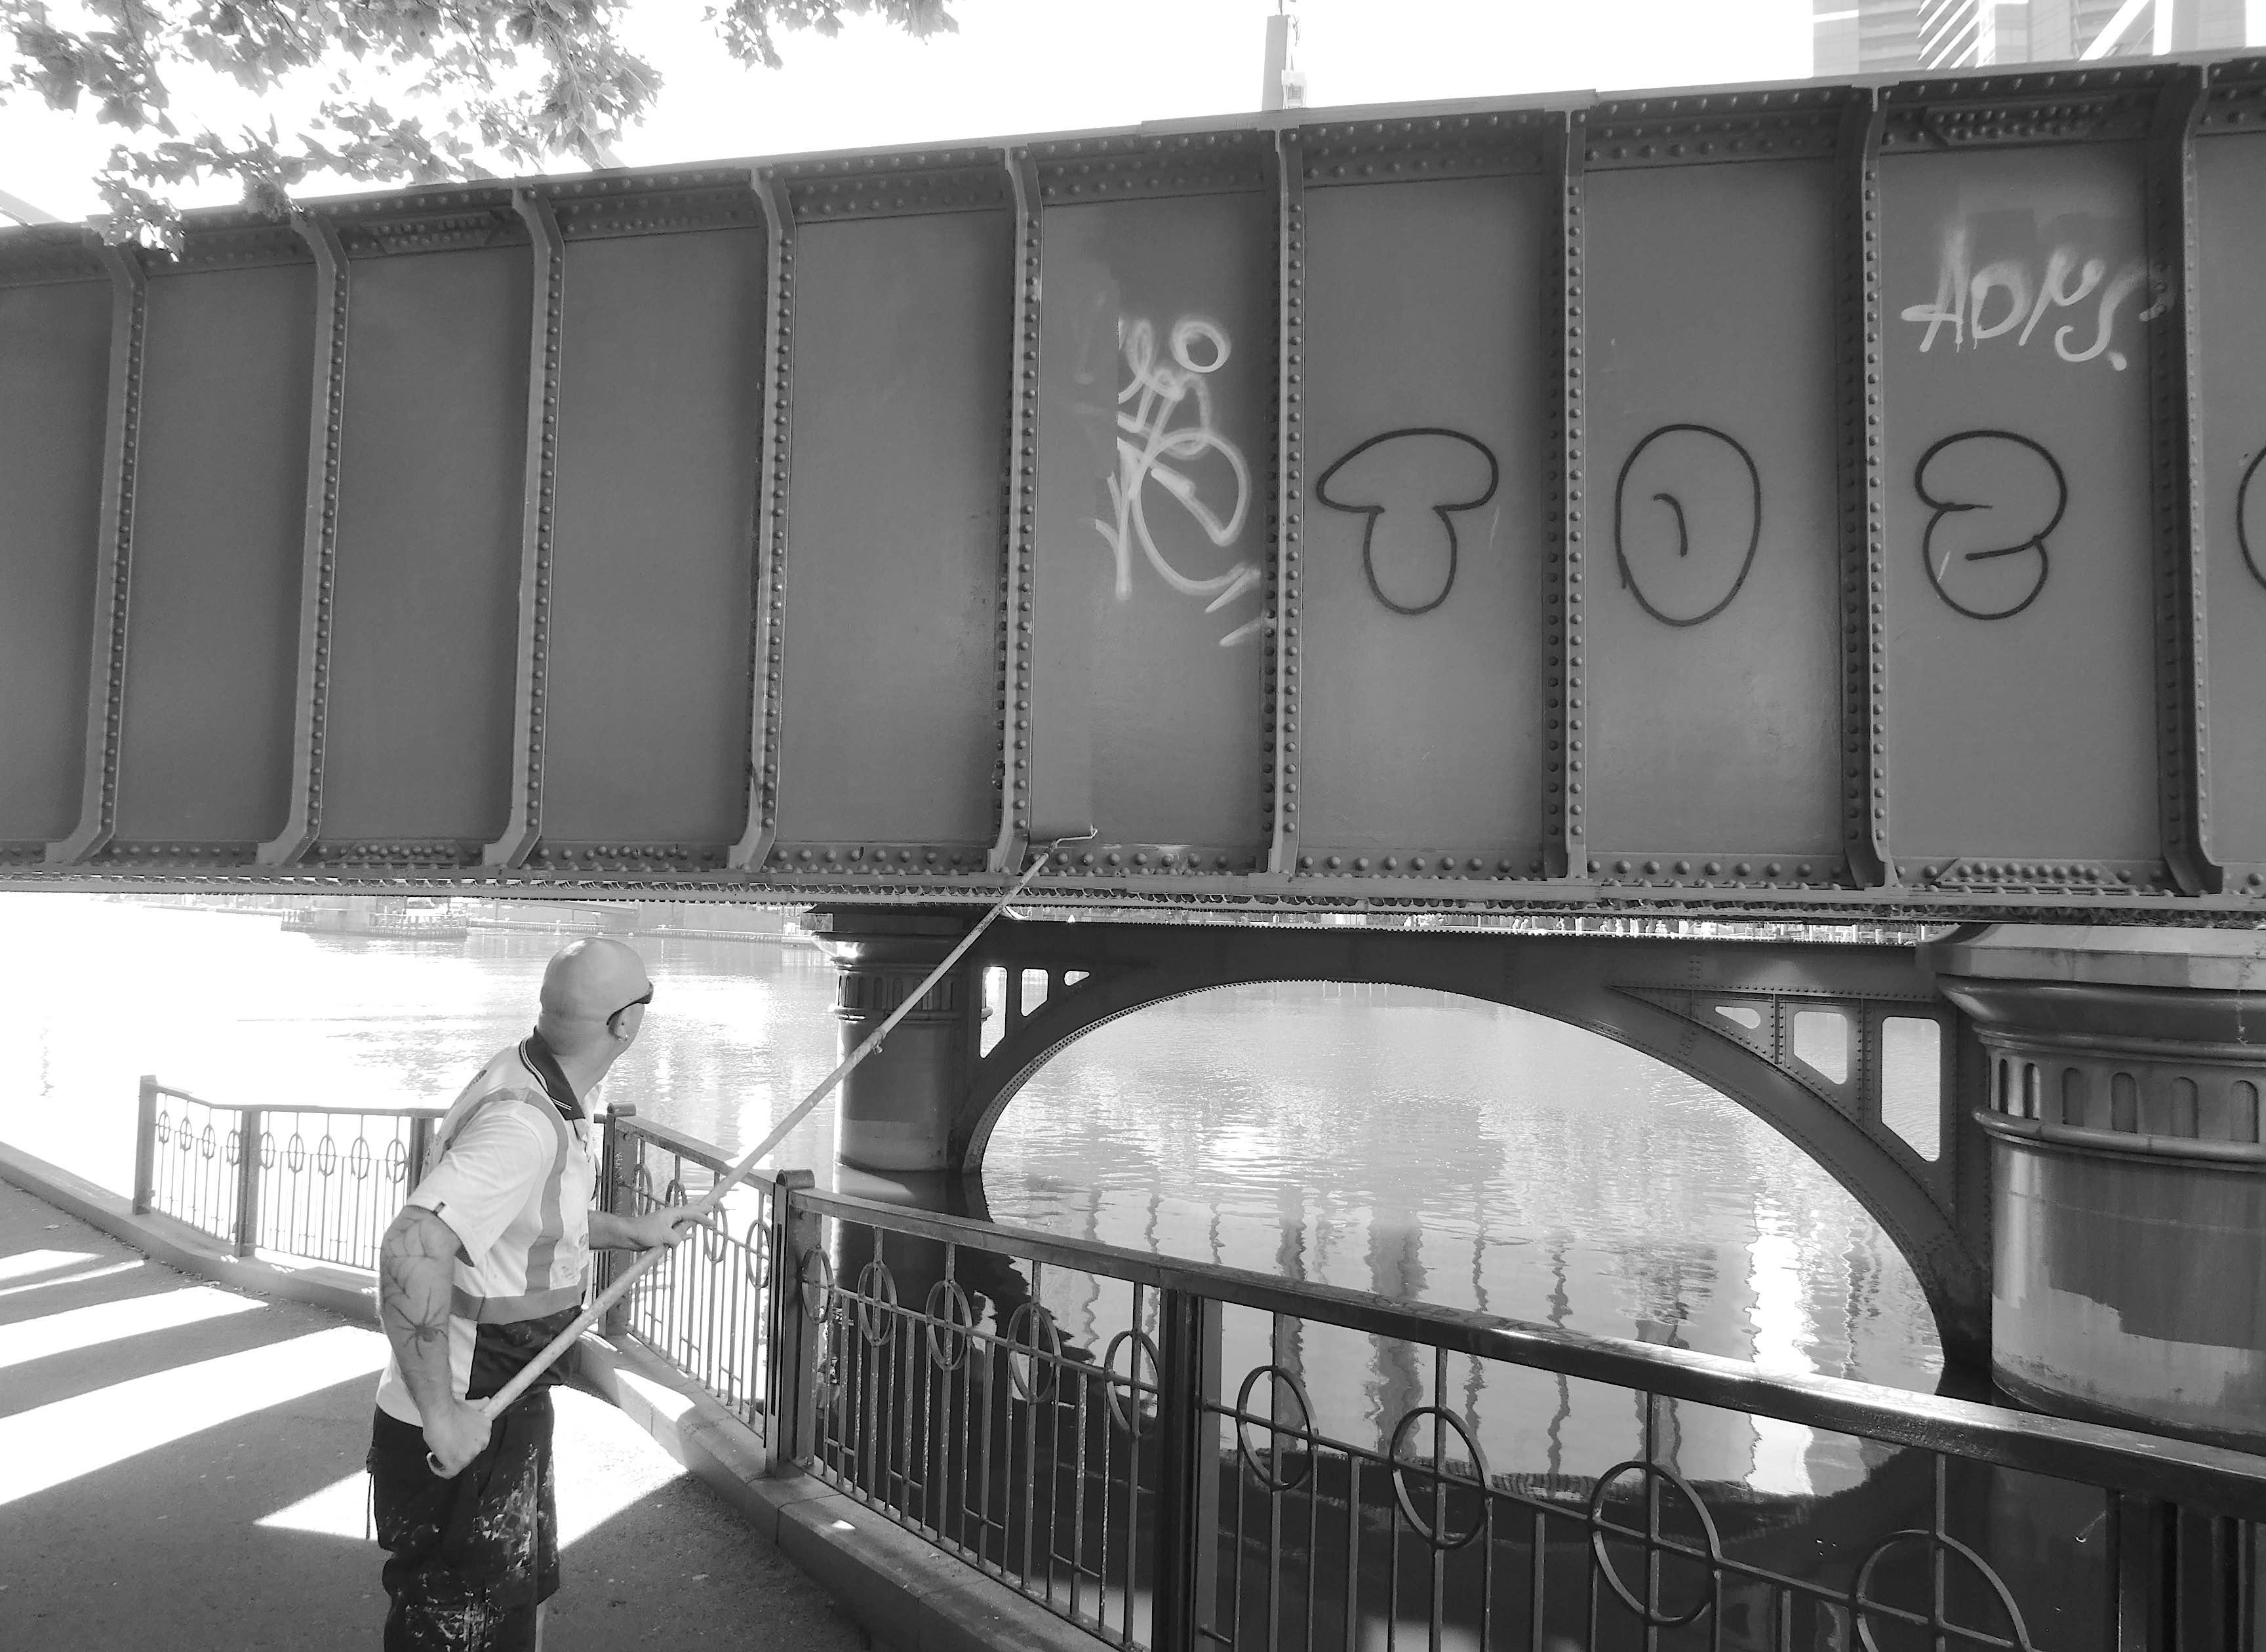 12.painting over graffiti